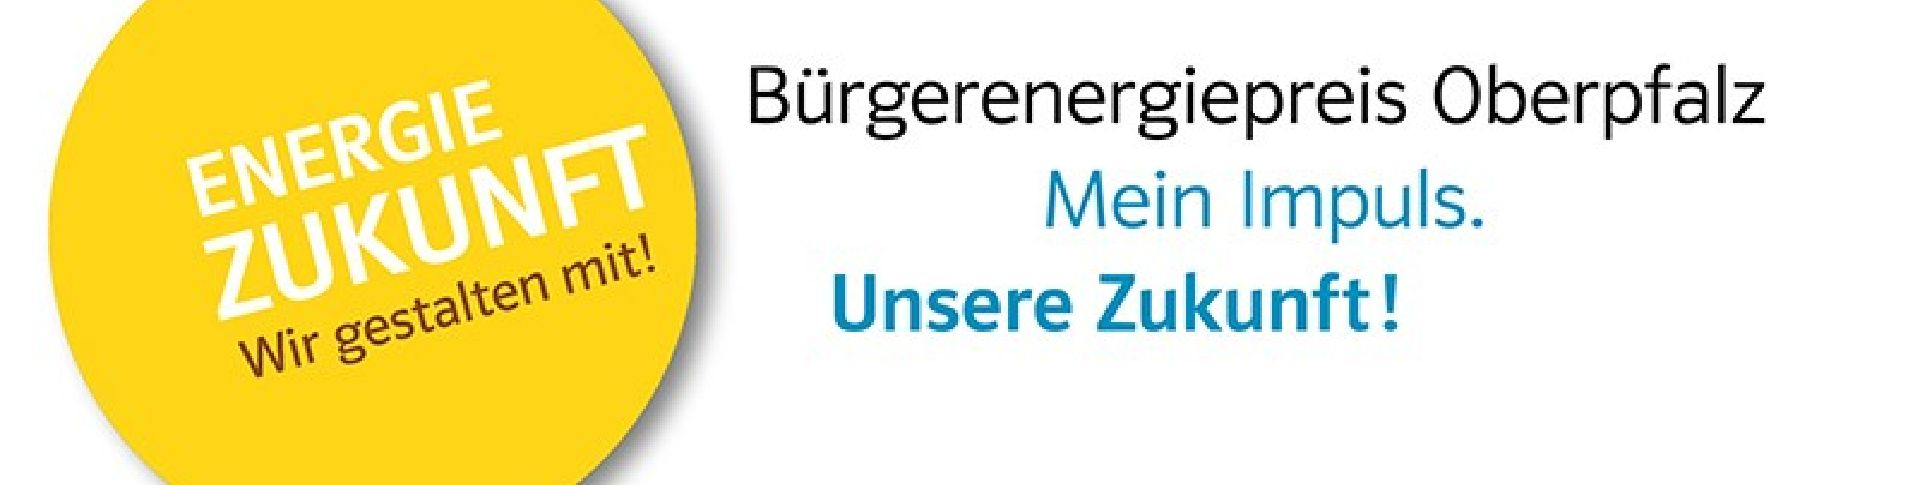 Bürgerenergiepreis Oberpfalz